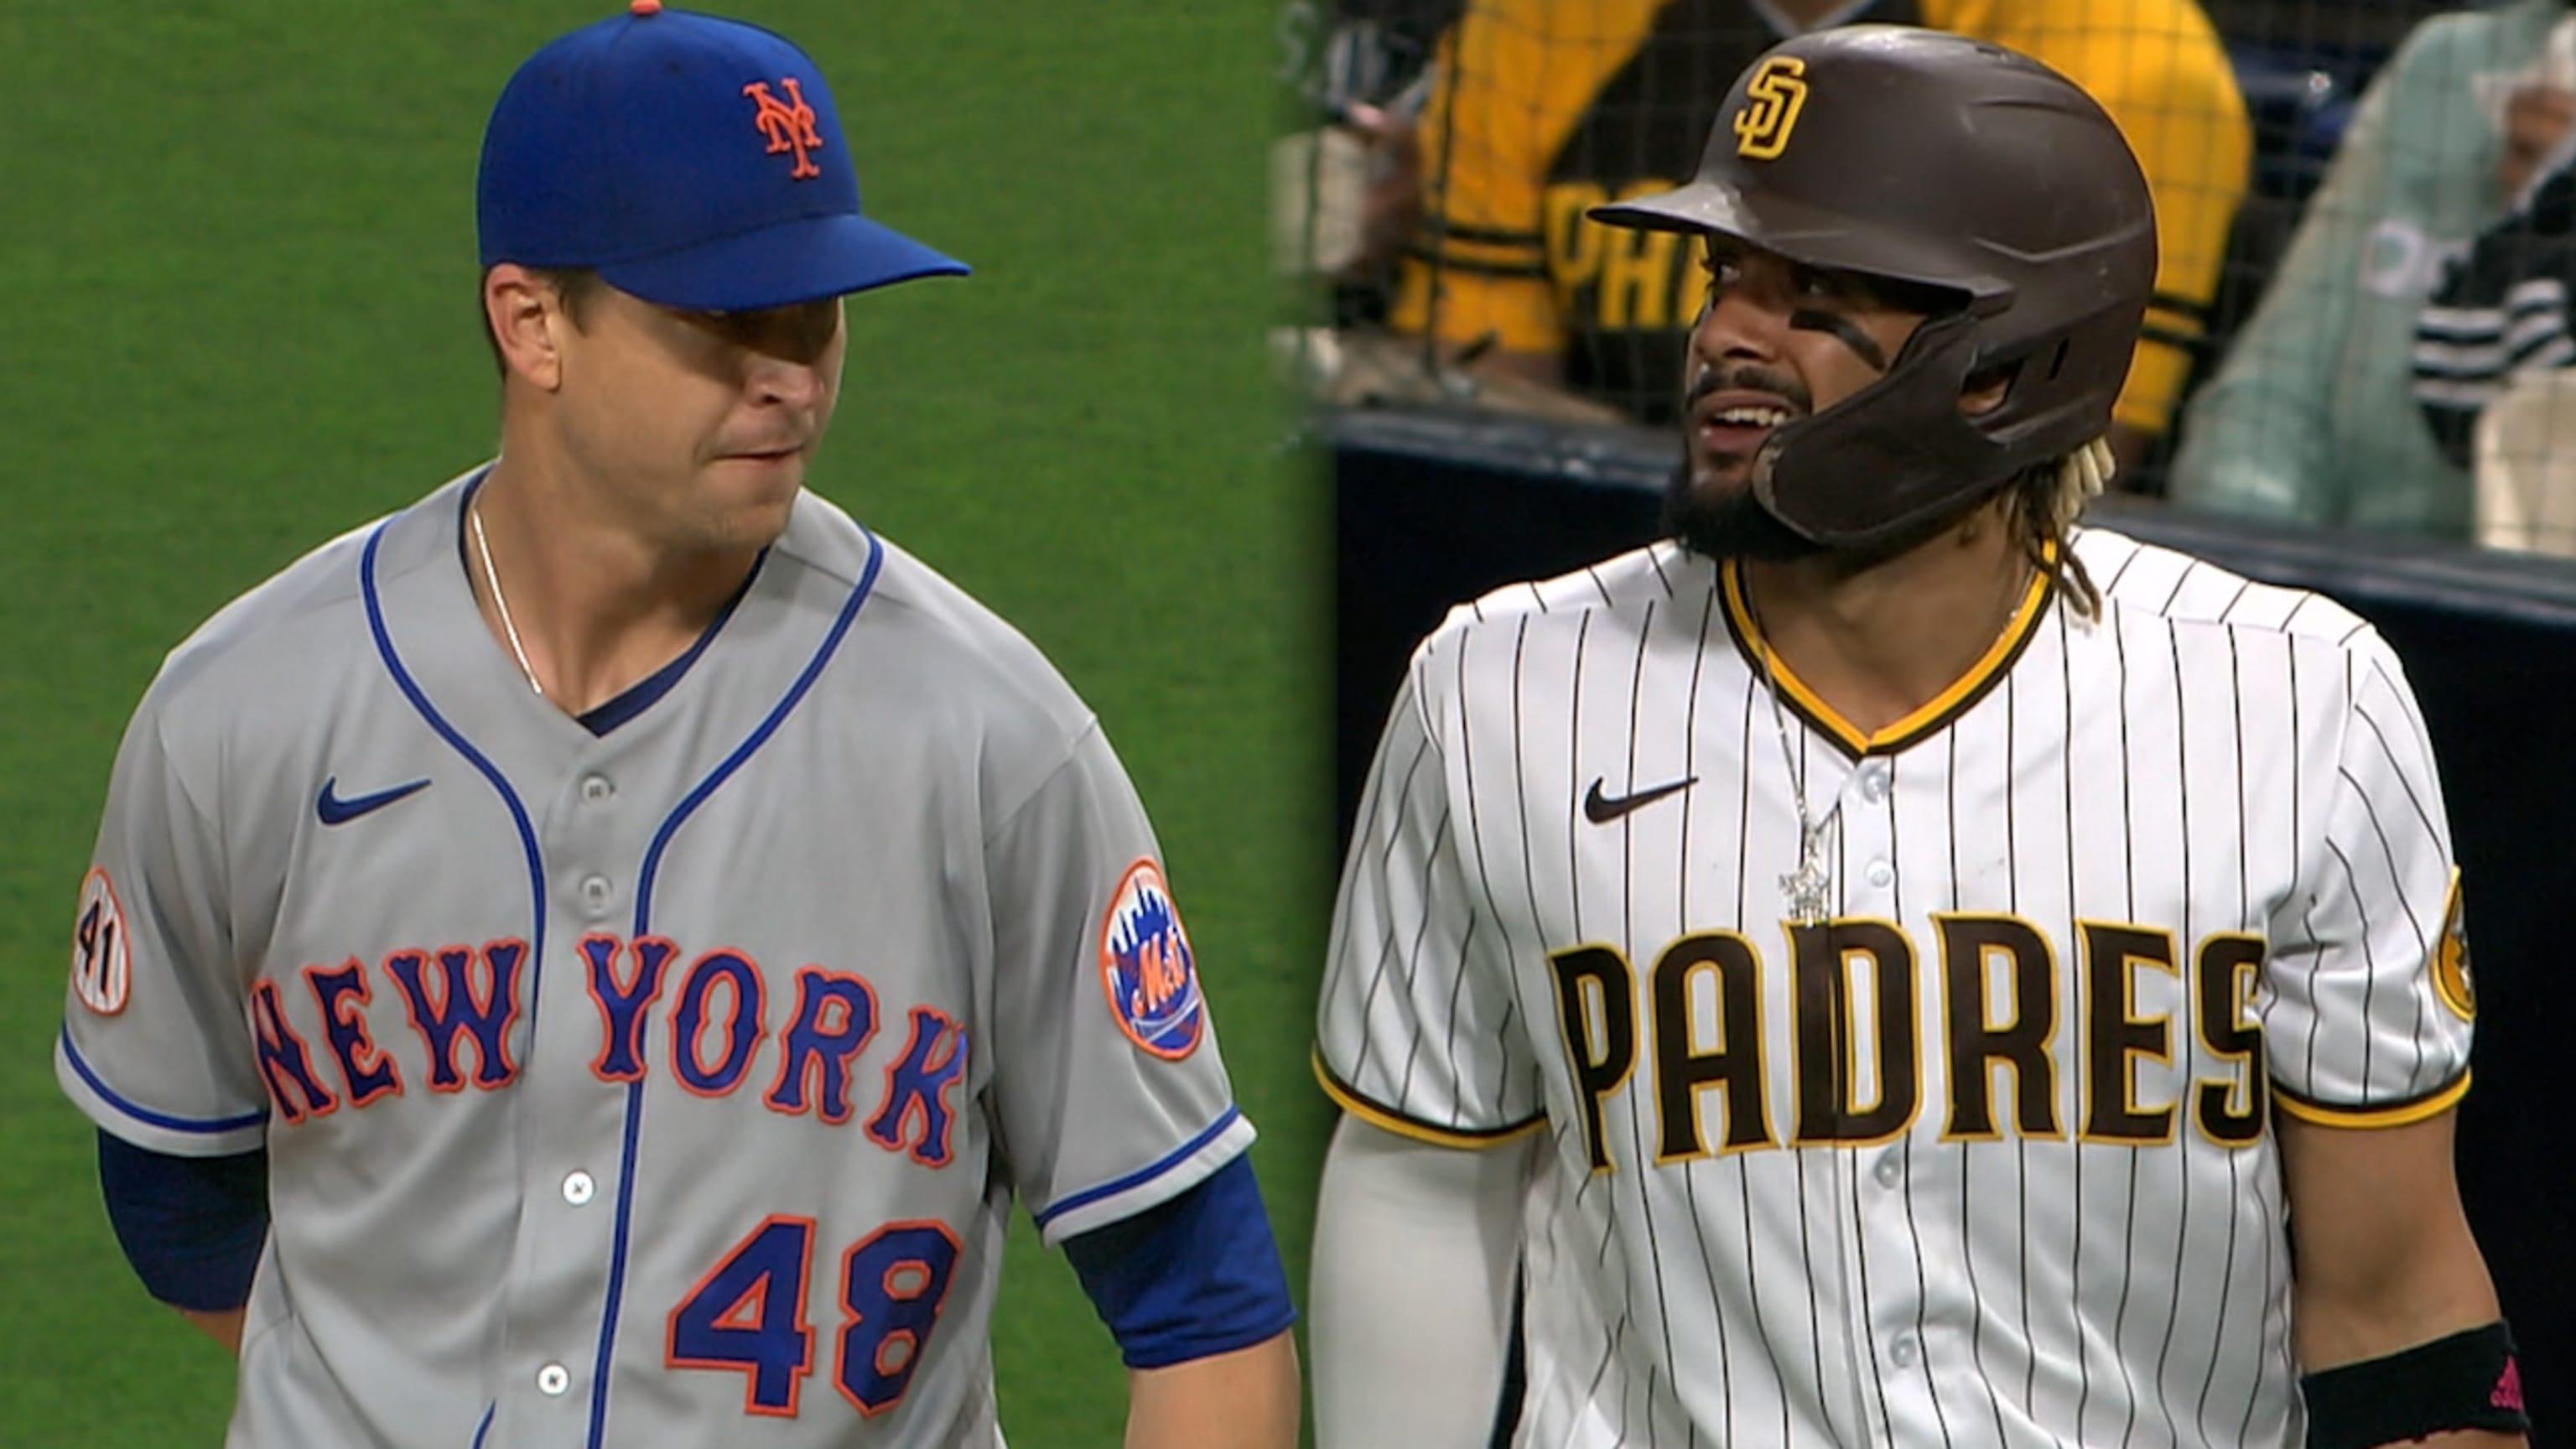 Jacob de Grom NY Mets New Arrival Baseball Player Black Golden Jersey